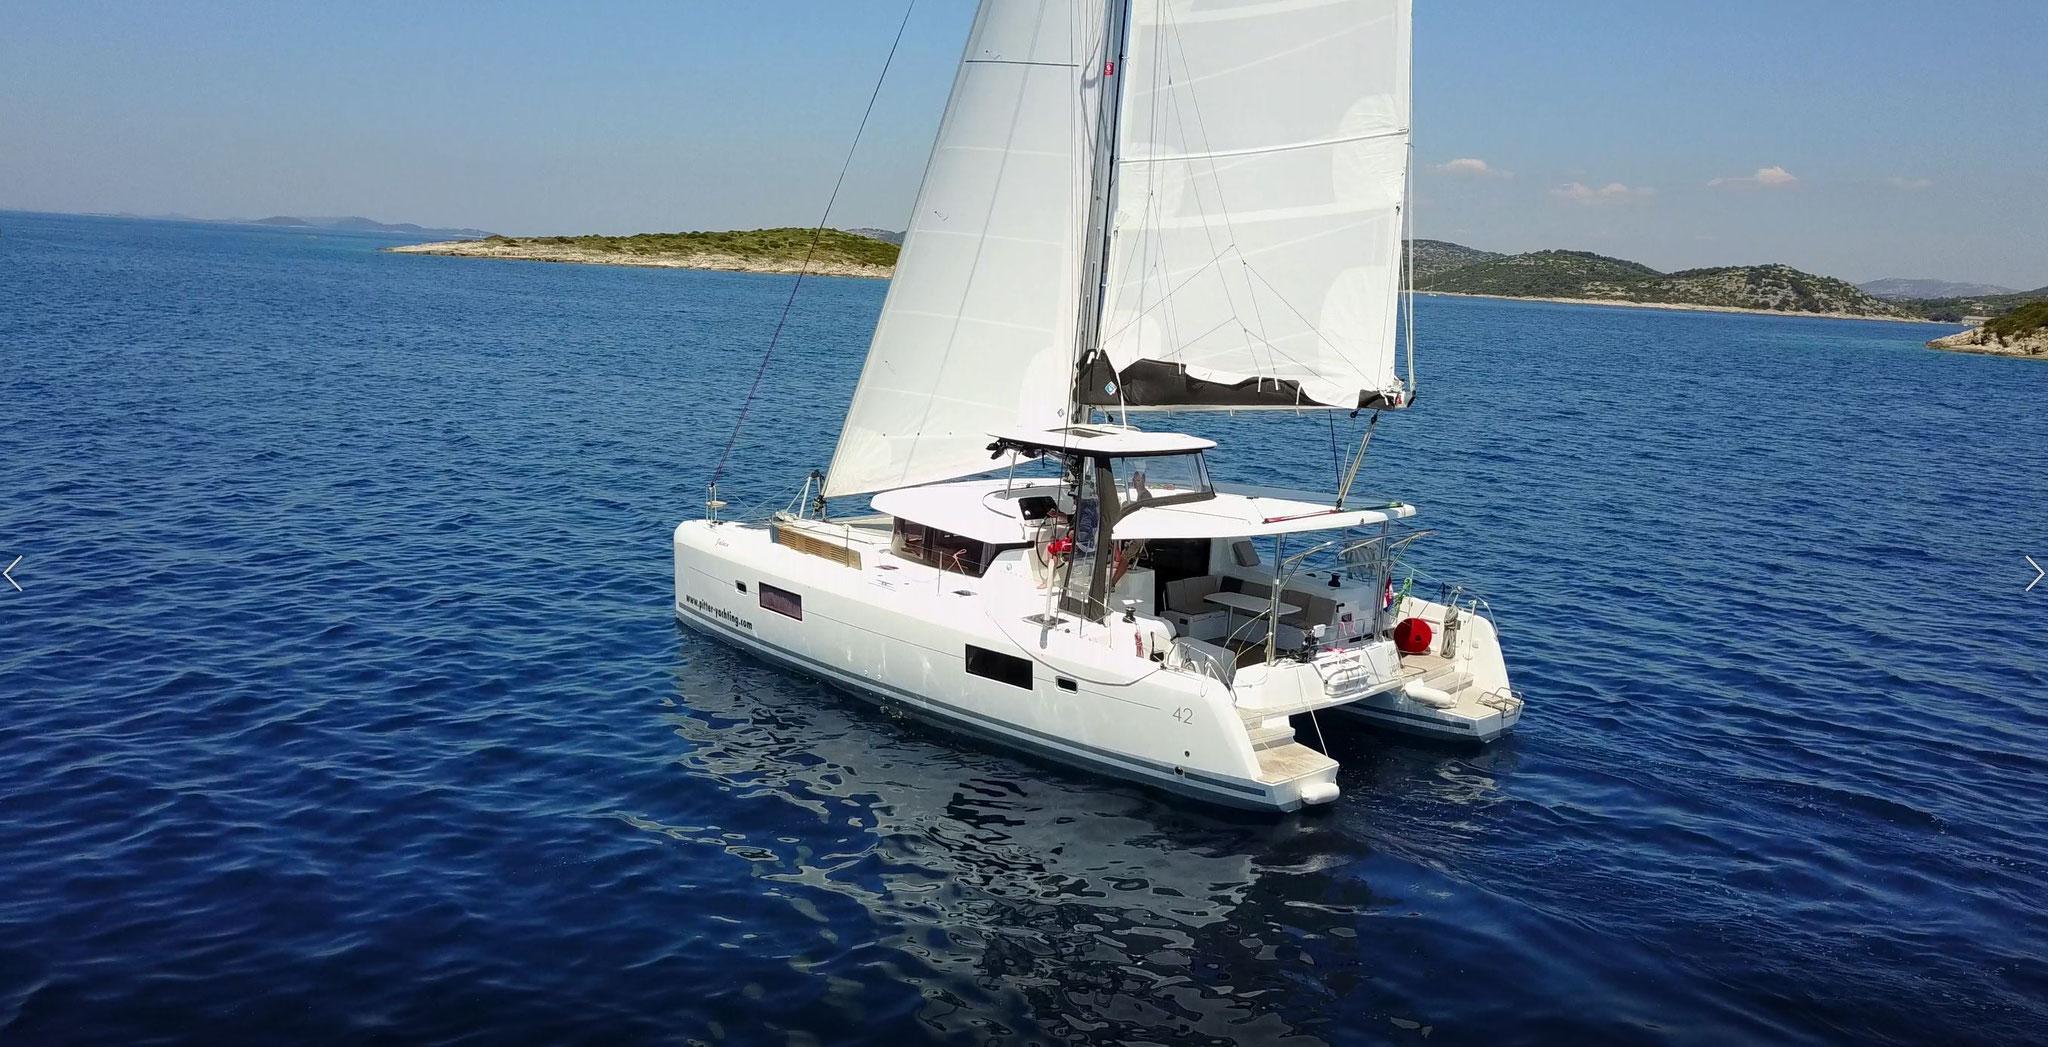 Katamaran segeln als Mitsegeln um Seemeilen zu sammeln - www.katamaramtraum.com